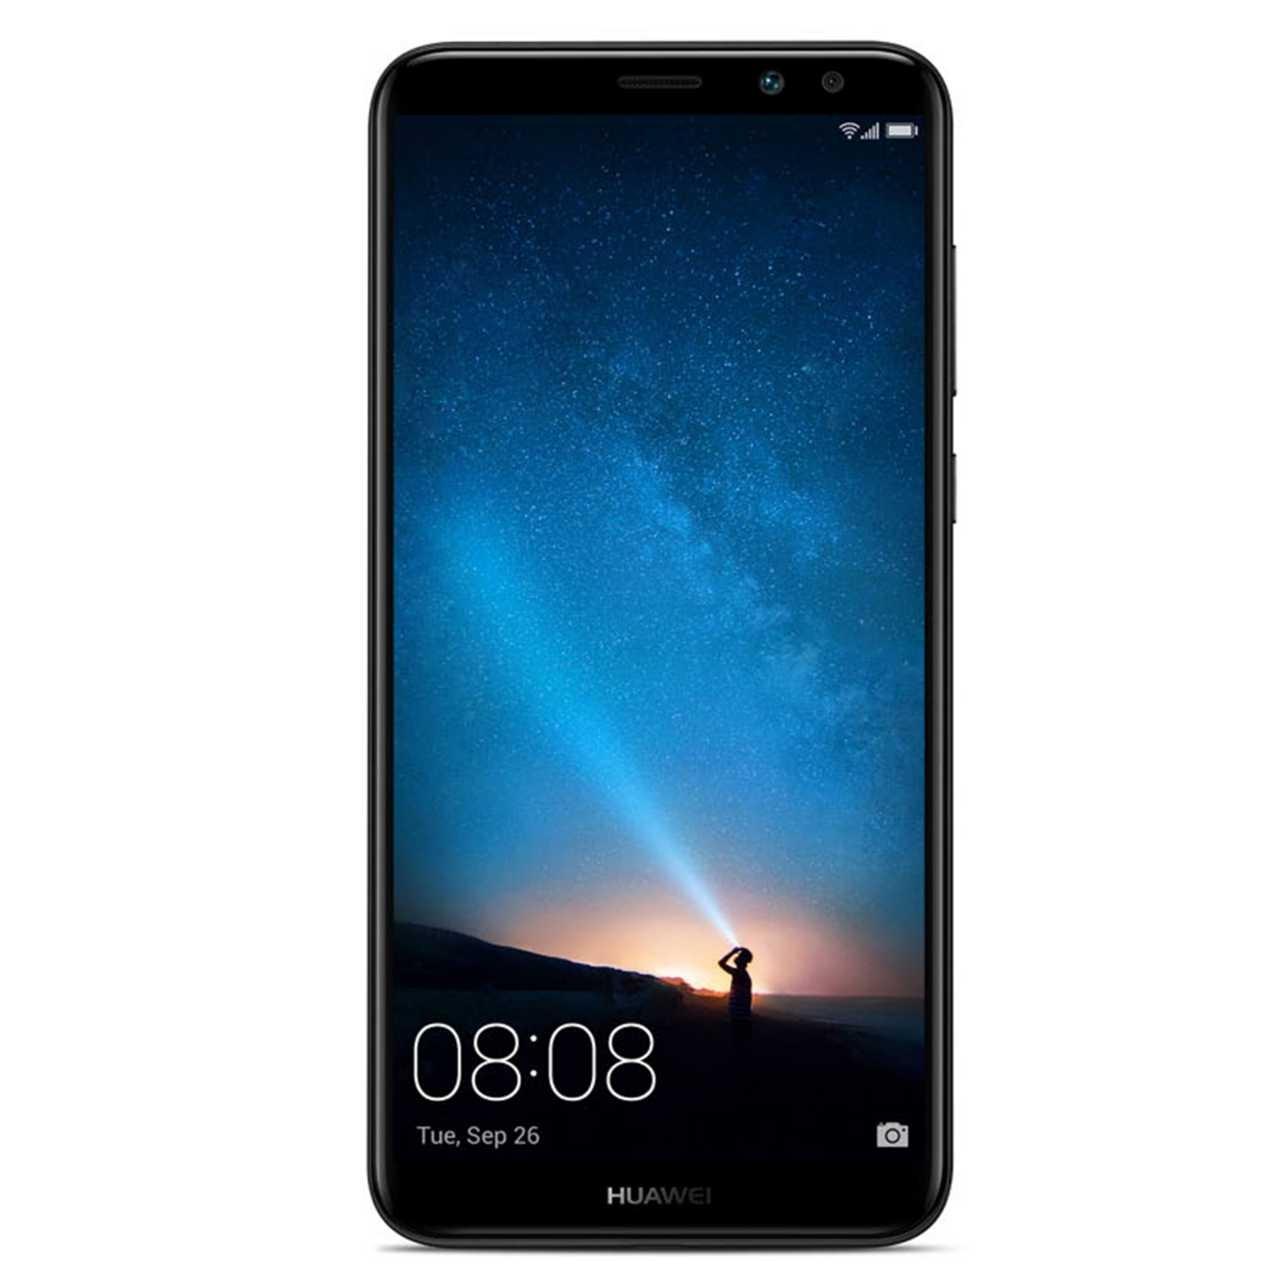 گوشی موبایل هوآوی مدل MATE 10 LITE-دو سیم کارت